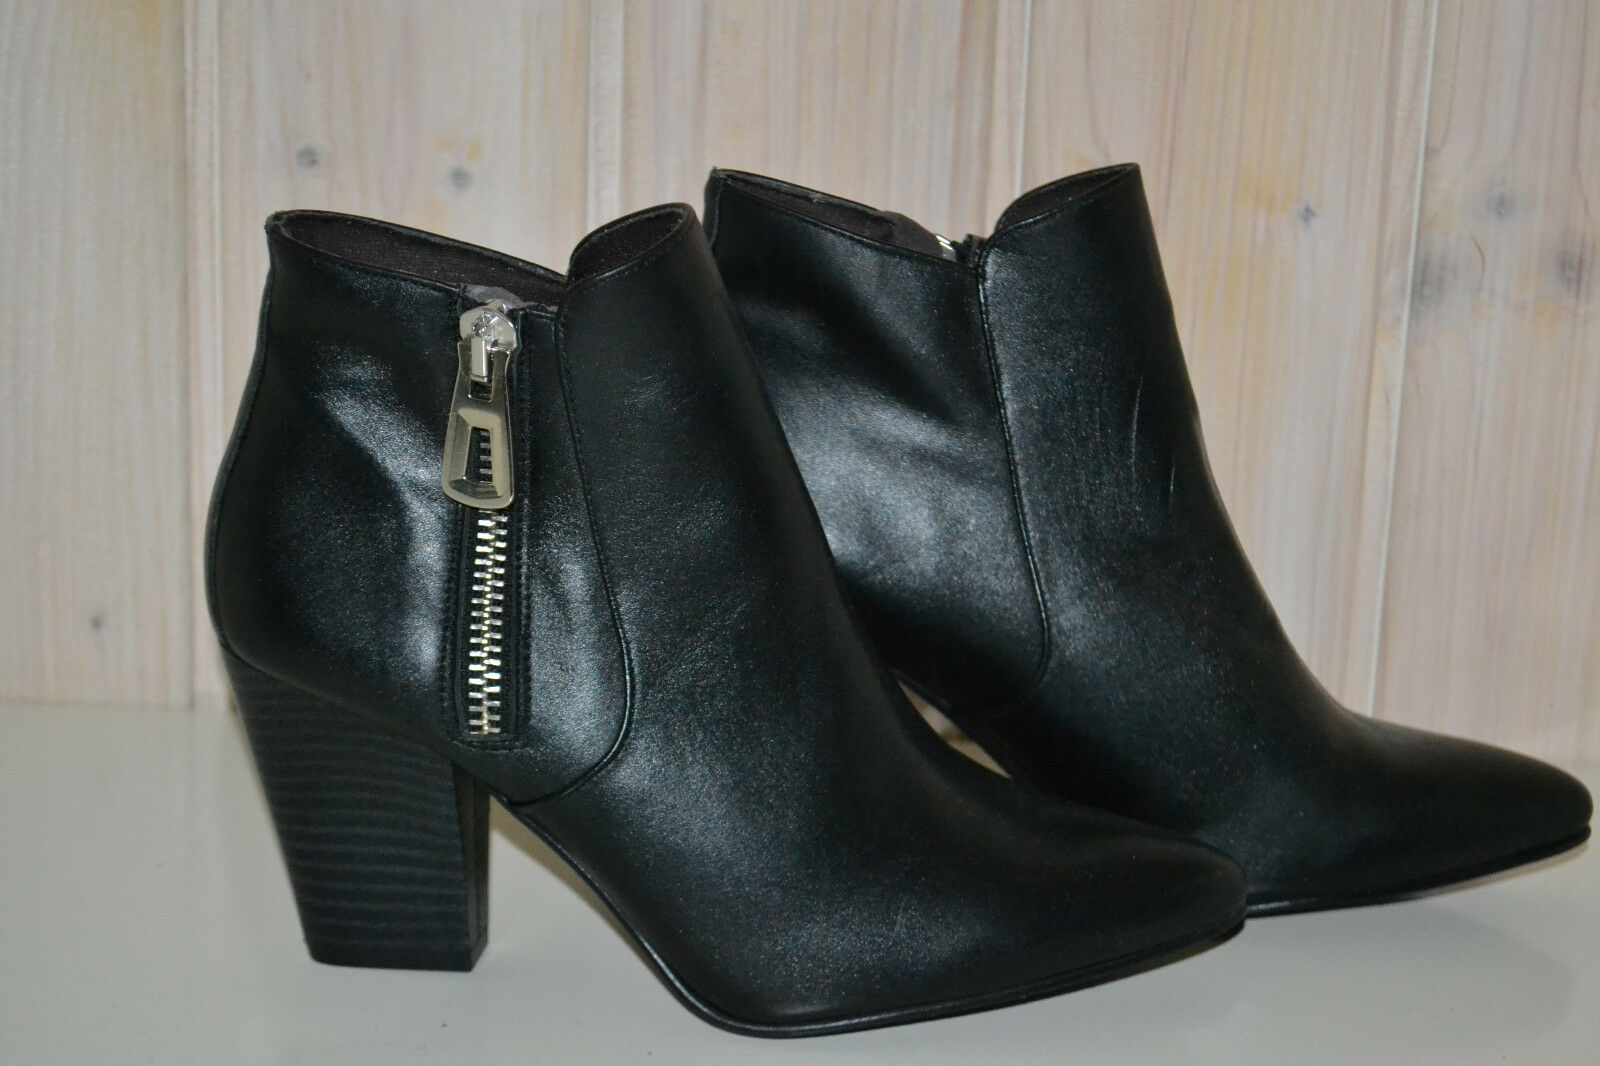 Folie`s Cazuse-Damen-Schuhe Stiefeletten Elegante-Echtleder-Schwarz-Gr.40-Neu